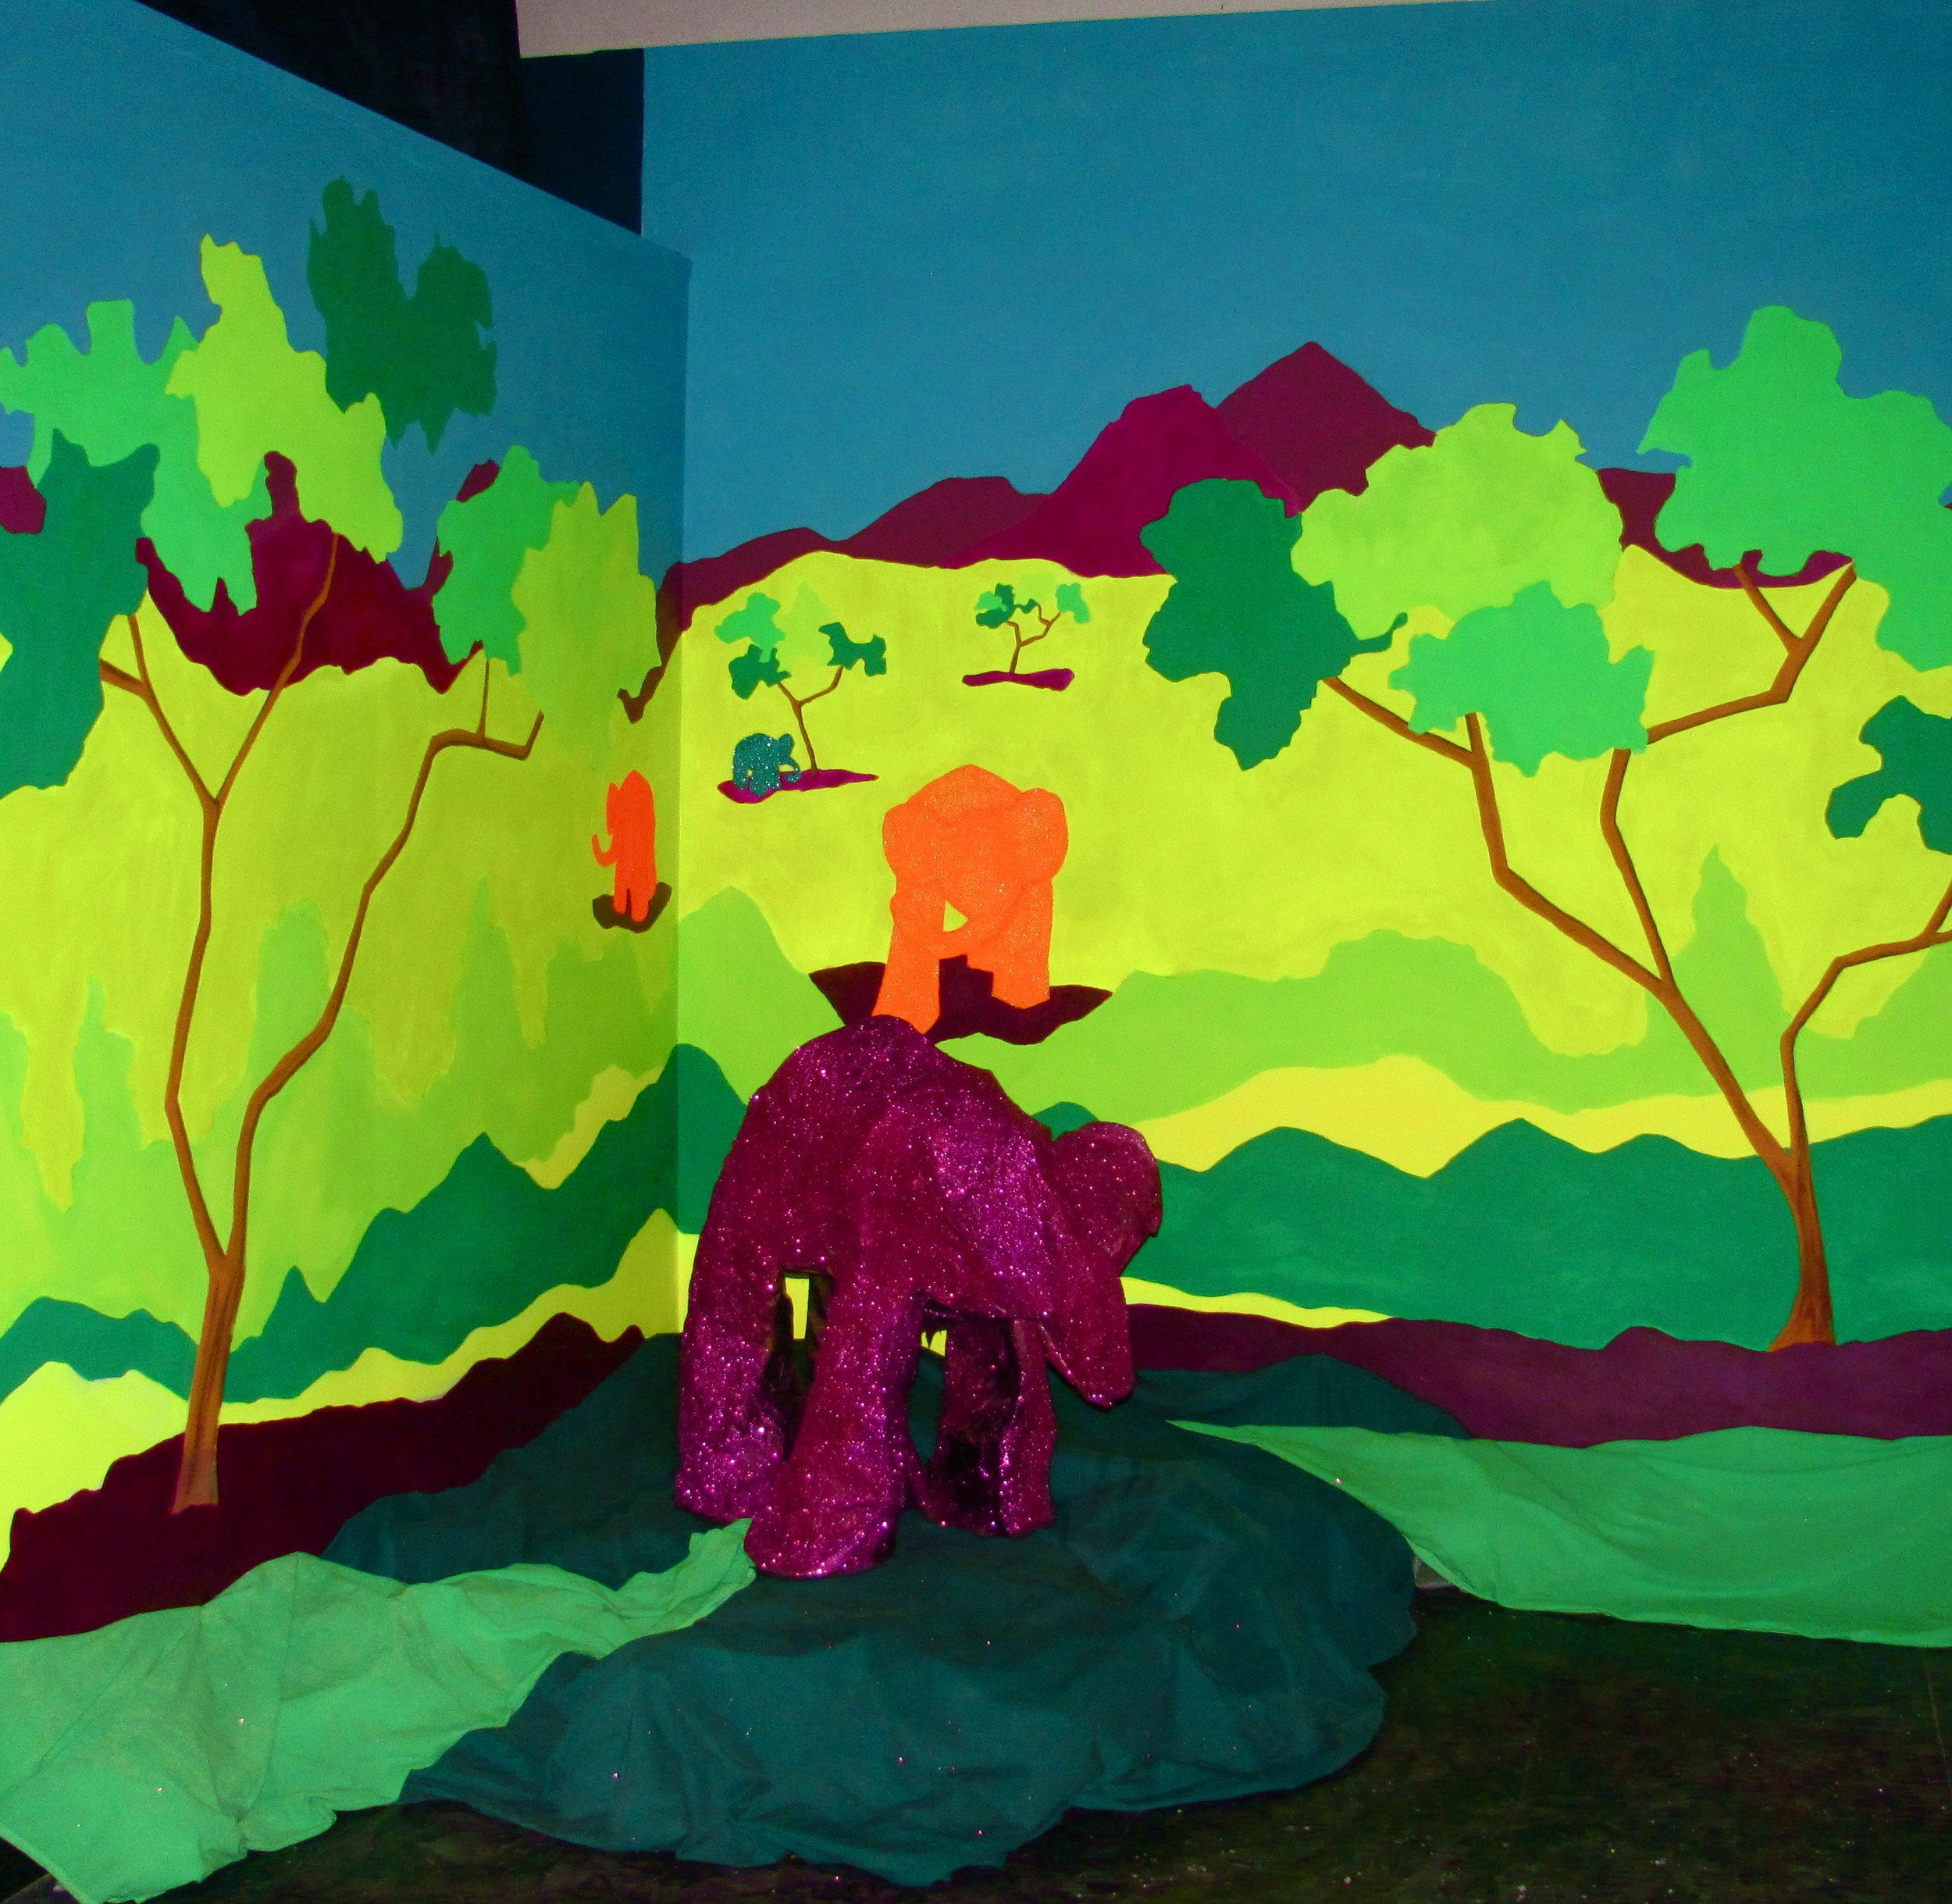 Glitter elephant habitat mural.  Materials: glow in the dark paint, glitter